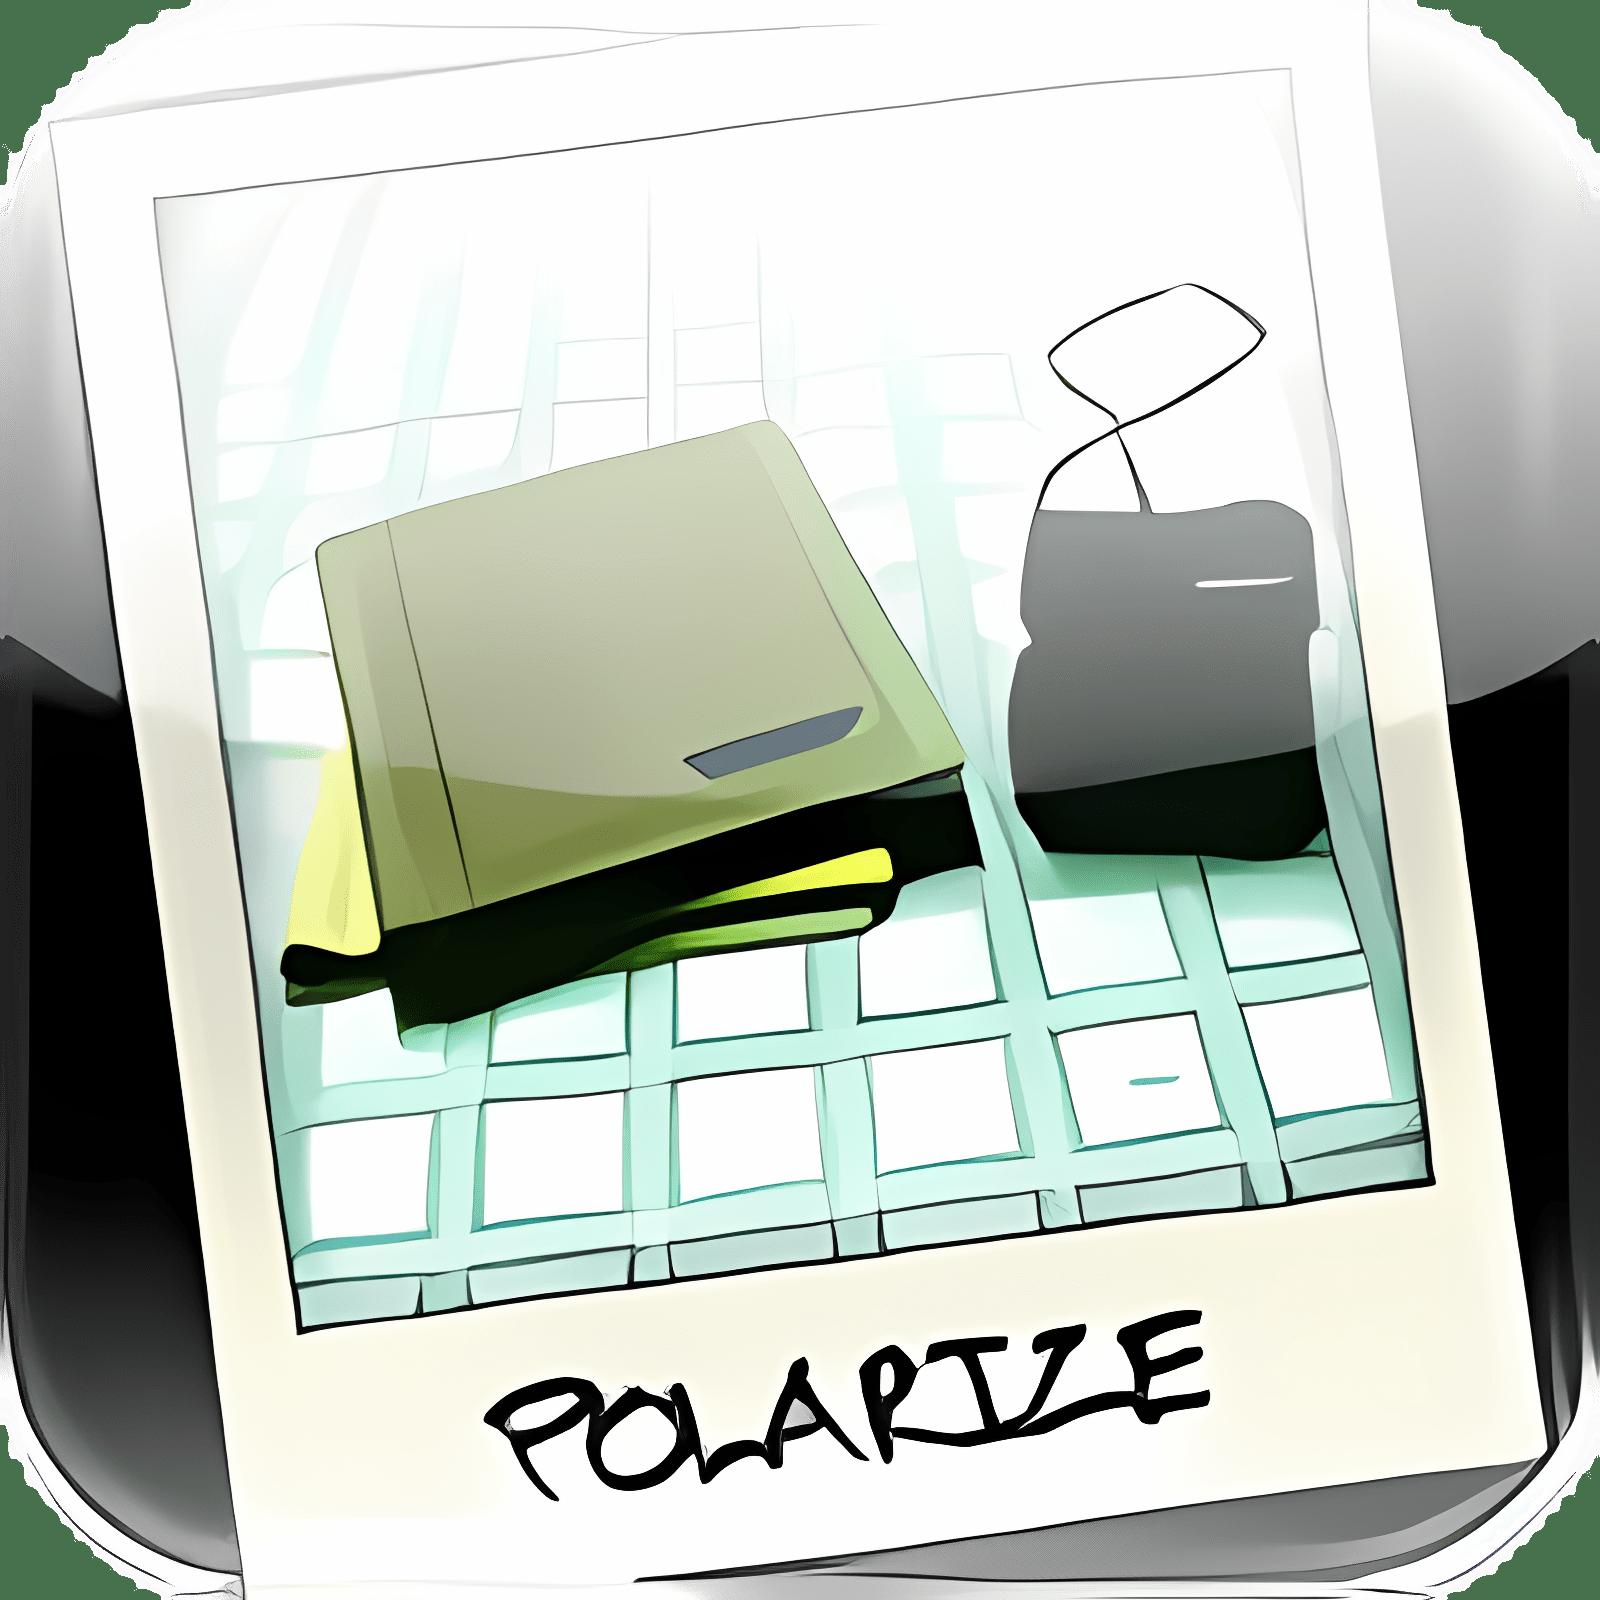 Polarize 1.1